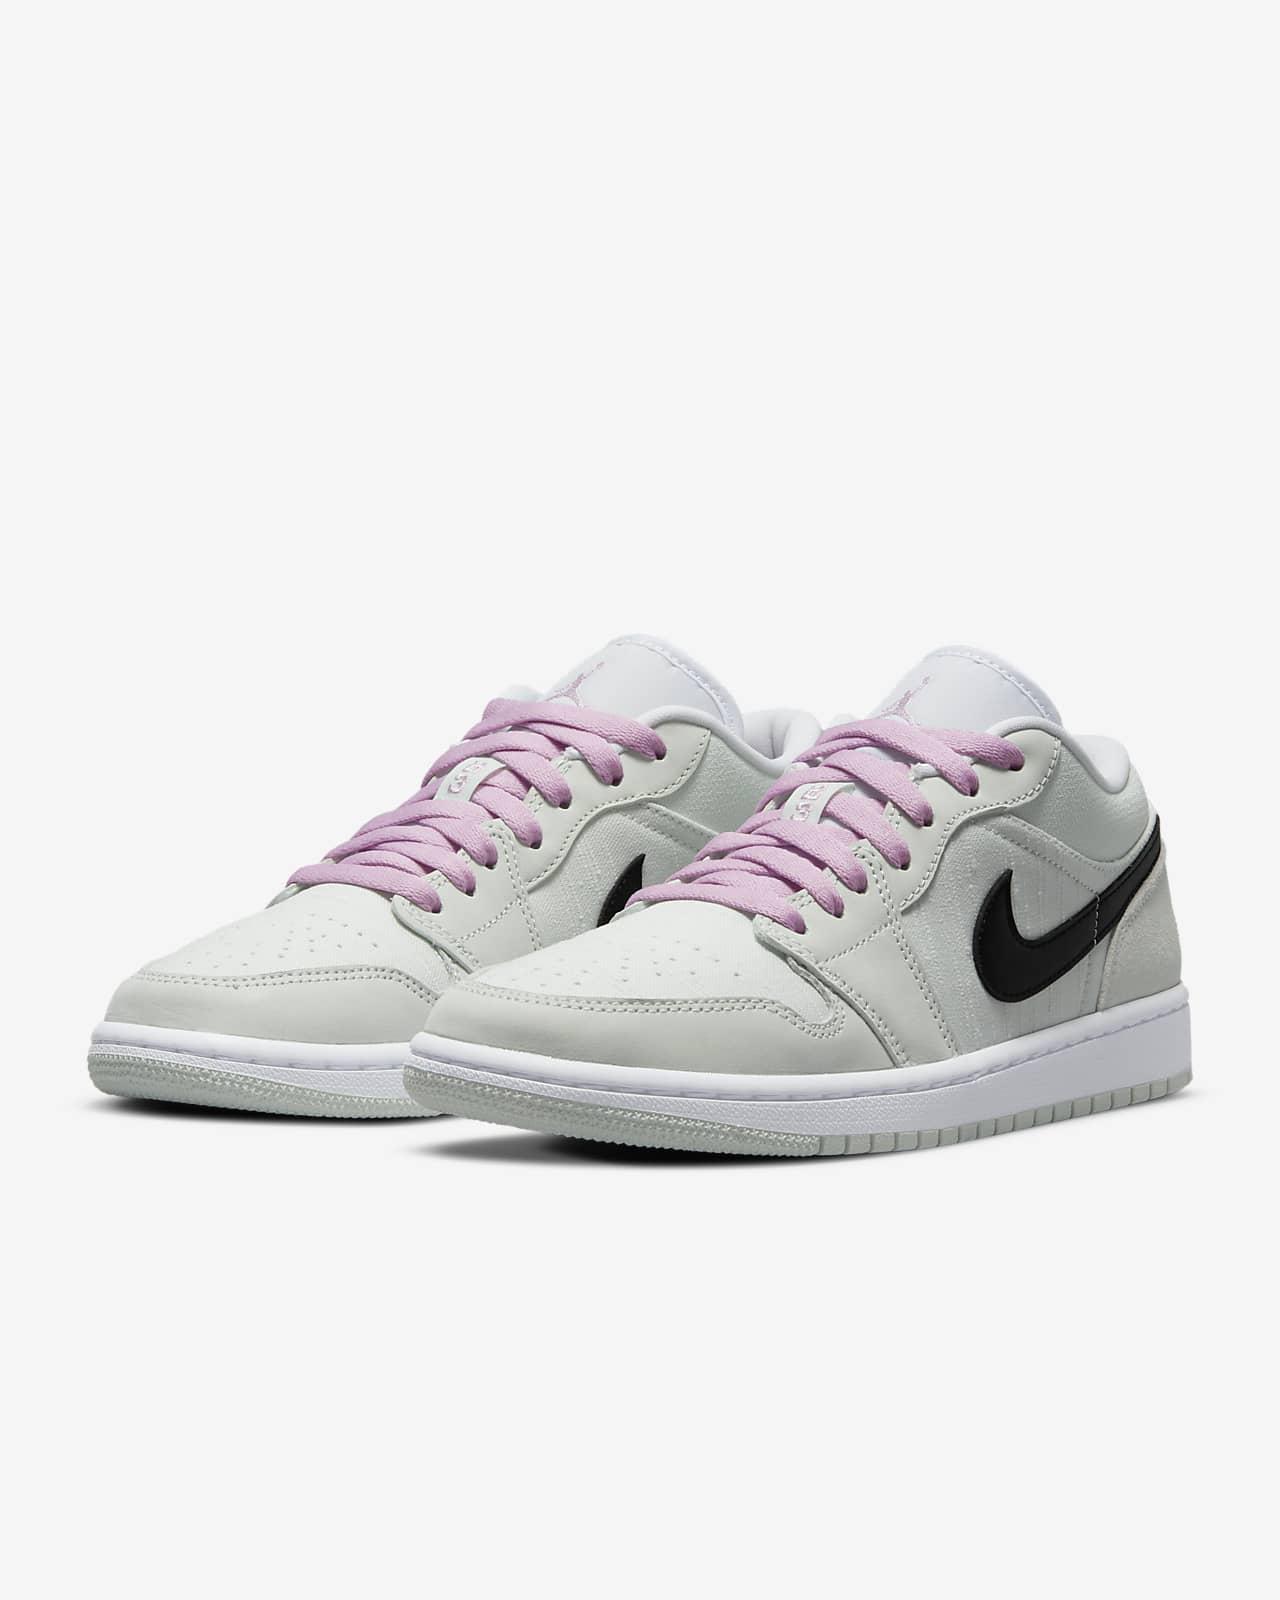 Air Jordan 1 Low SE Women's Shoes. Nike.com